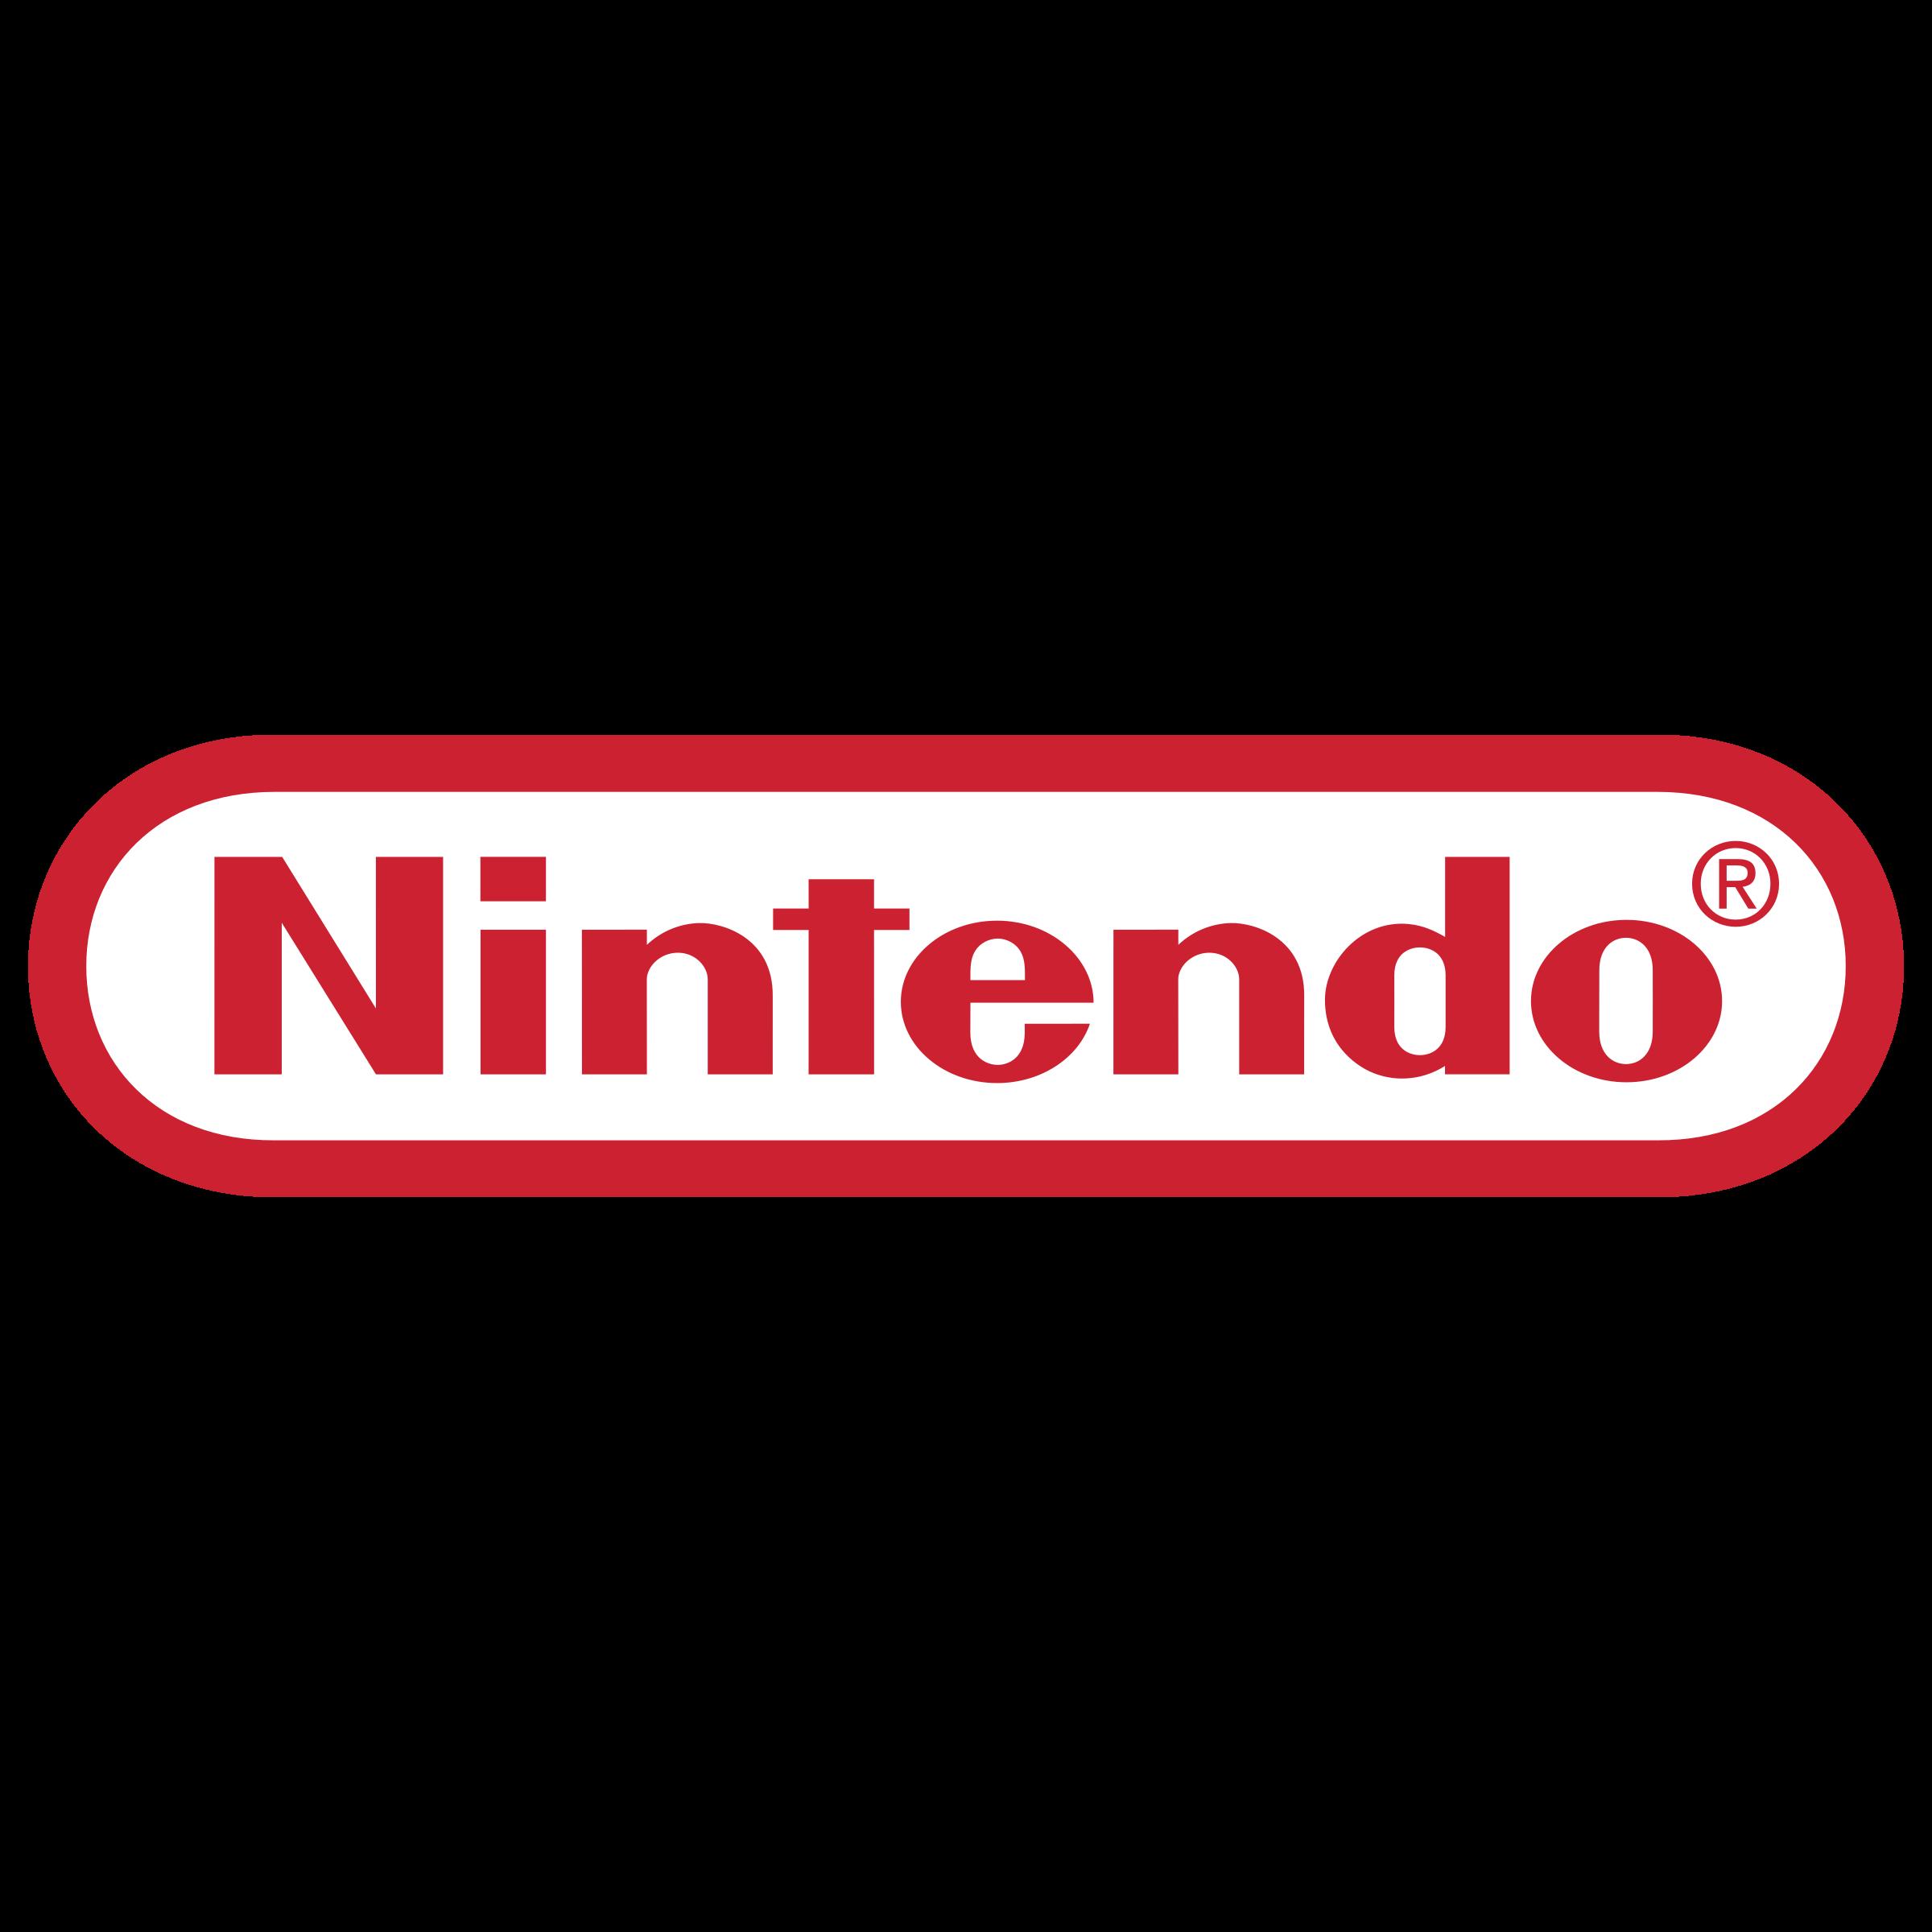 nintendo logo png transparent svg vector freebie supply rh freebiesupply com nintendo logo vector free nintendo logo vectorizado